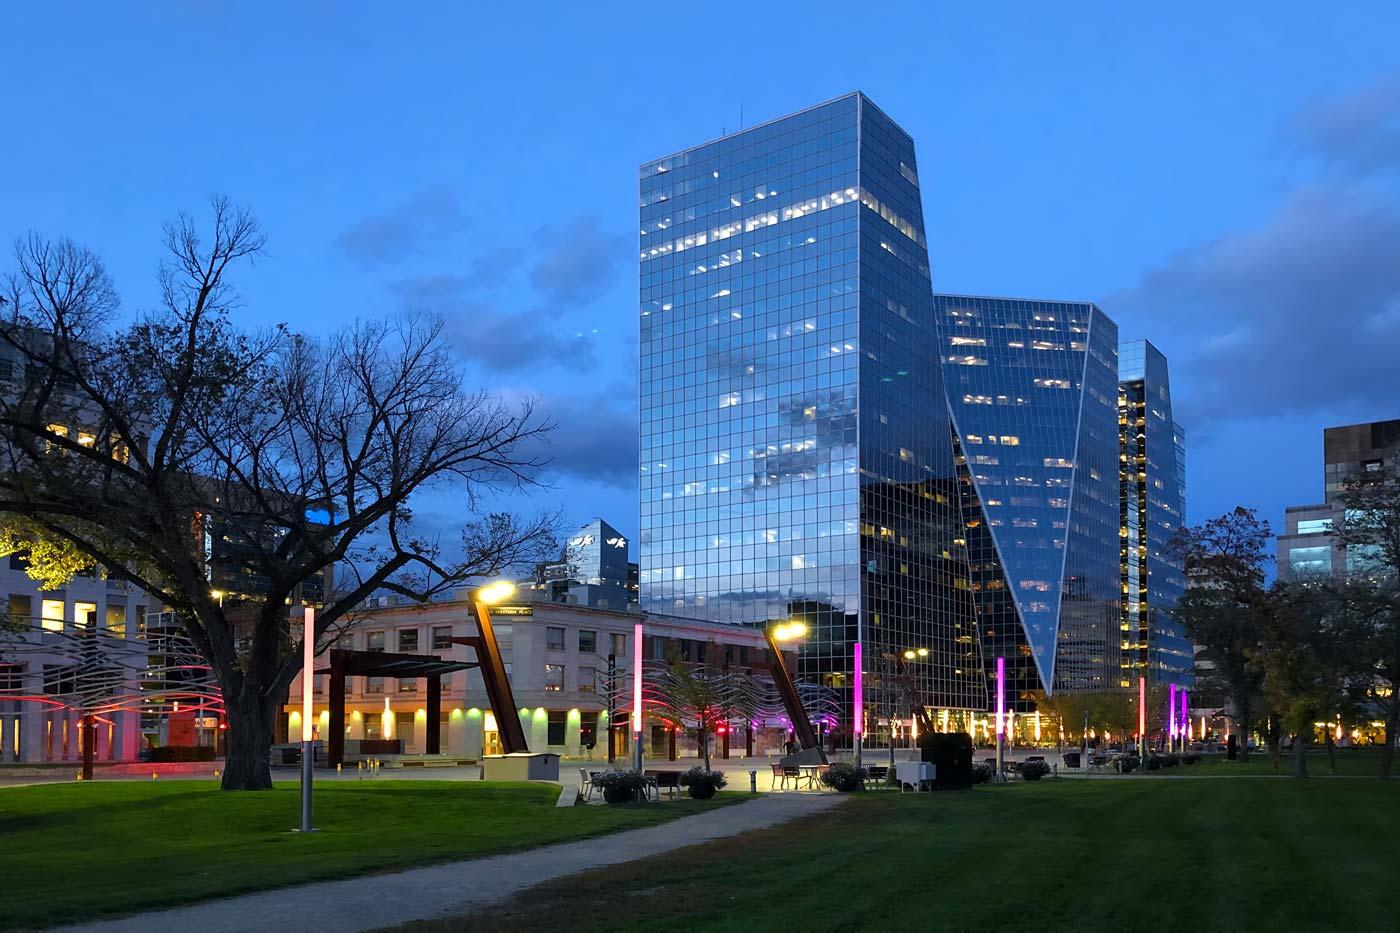 Downtown Regina at night.